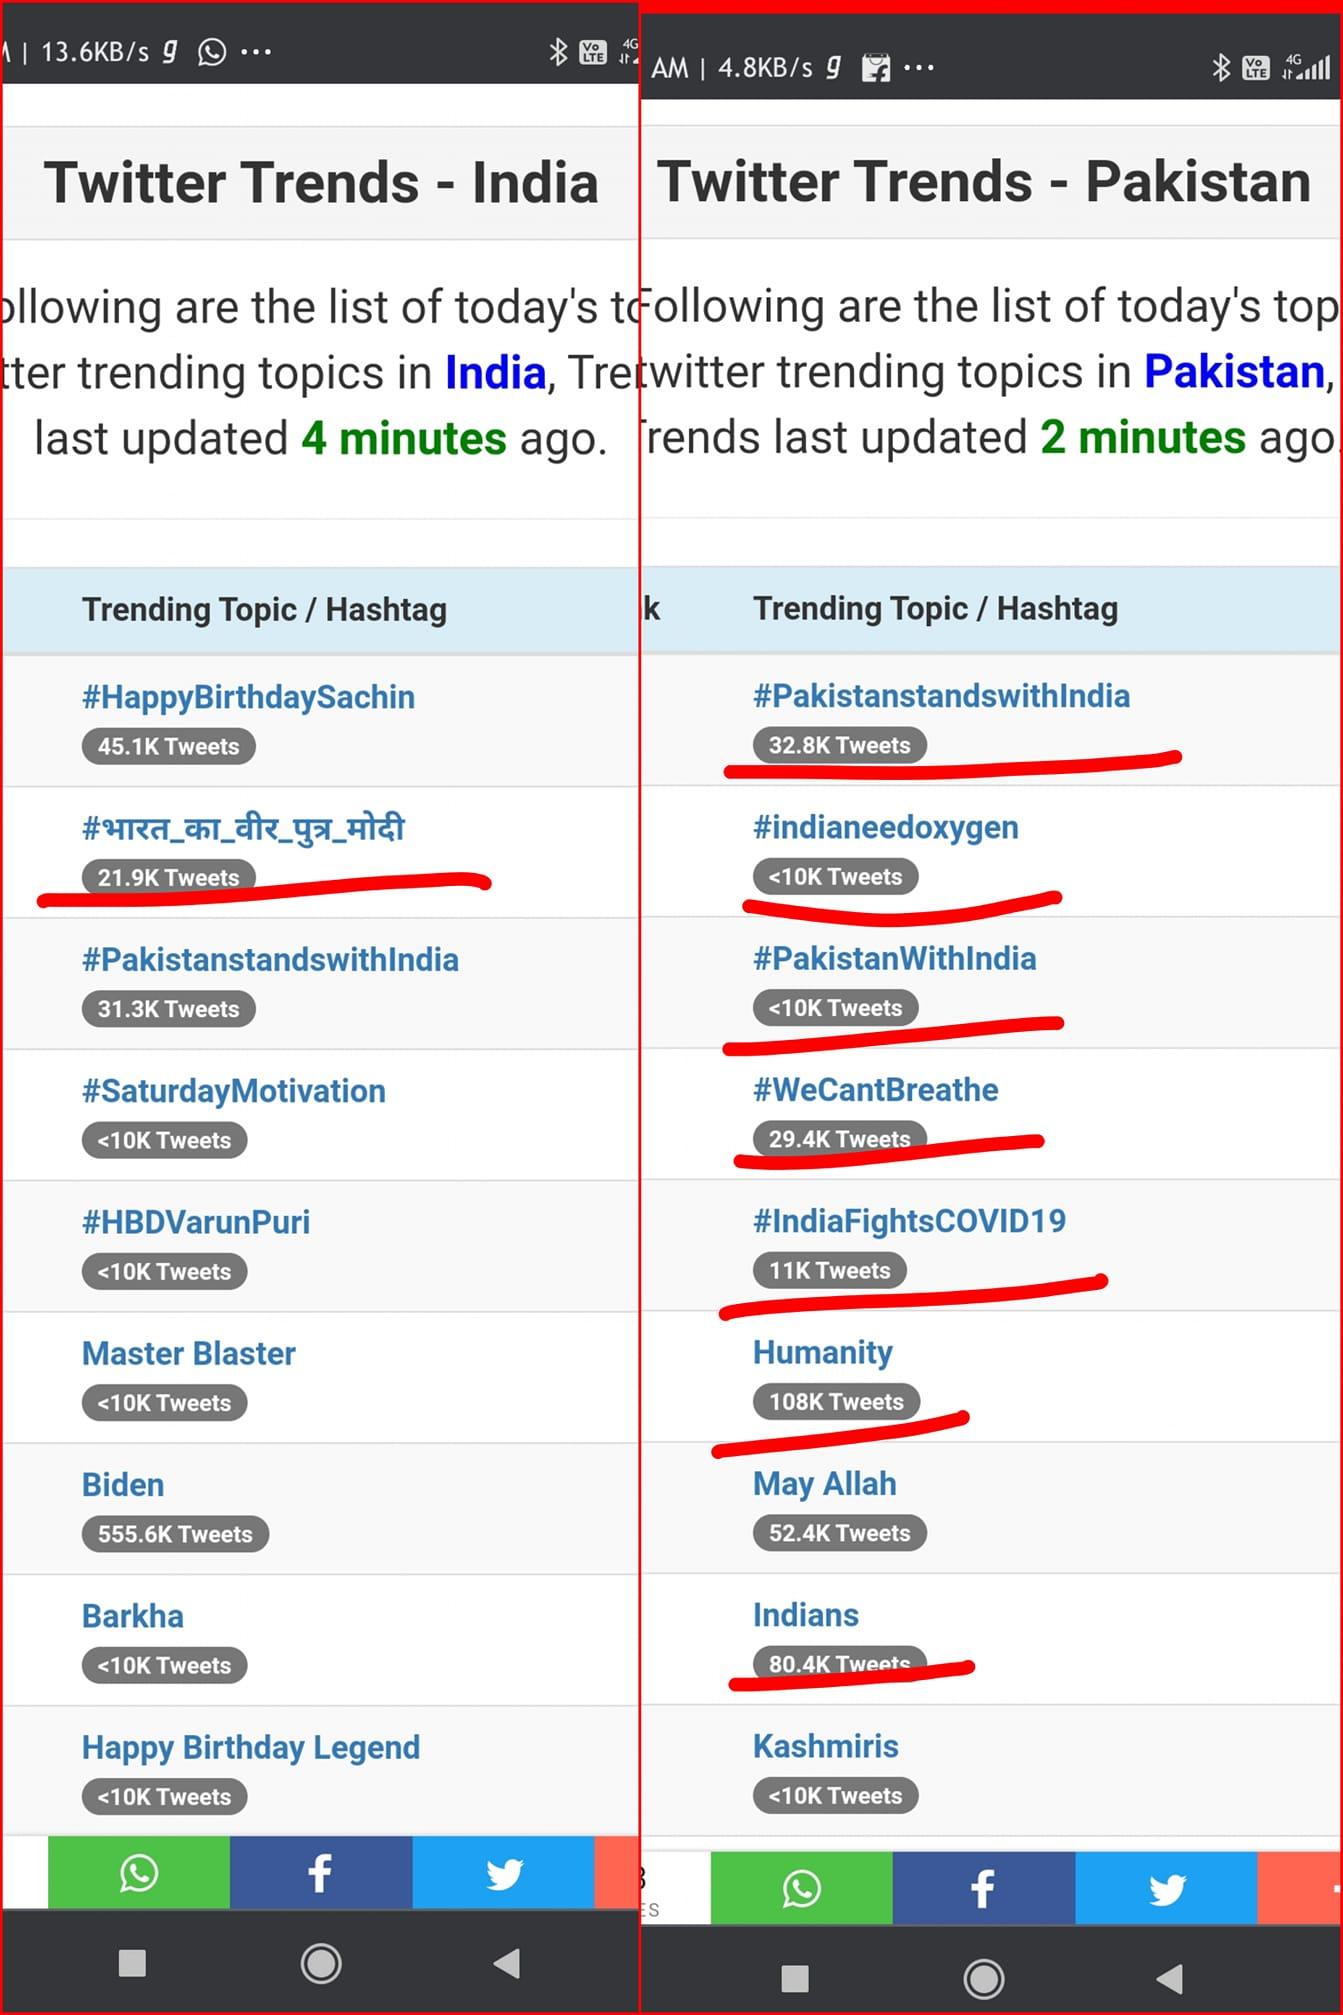 India-Pakistan Twitter Trends Covid 2021